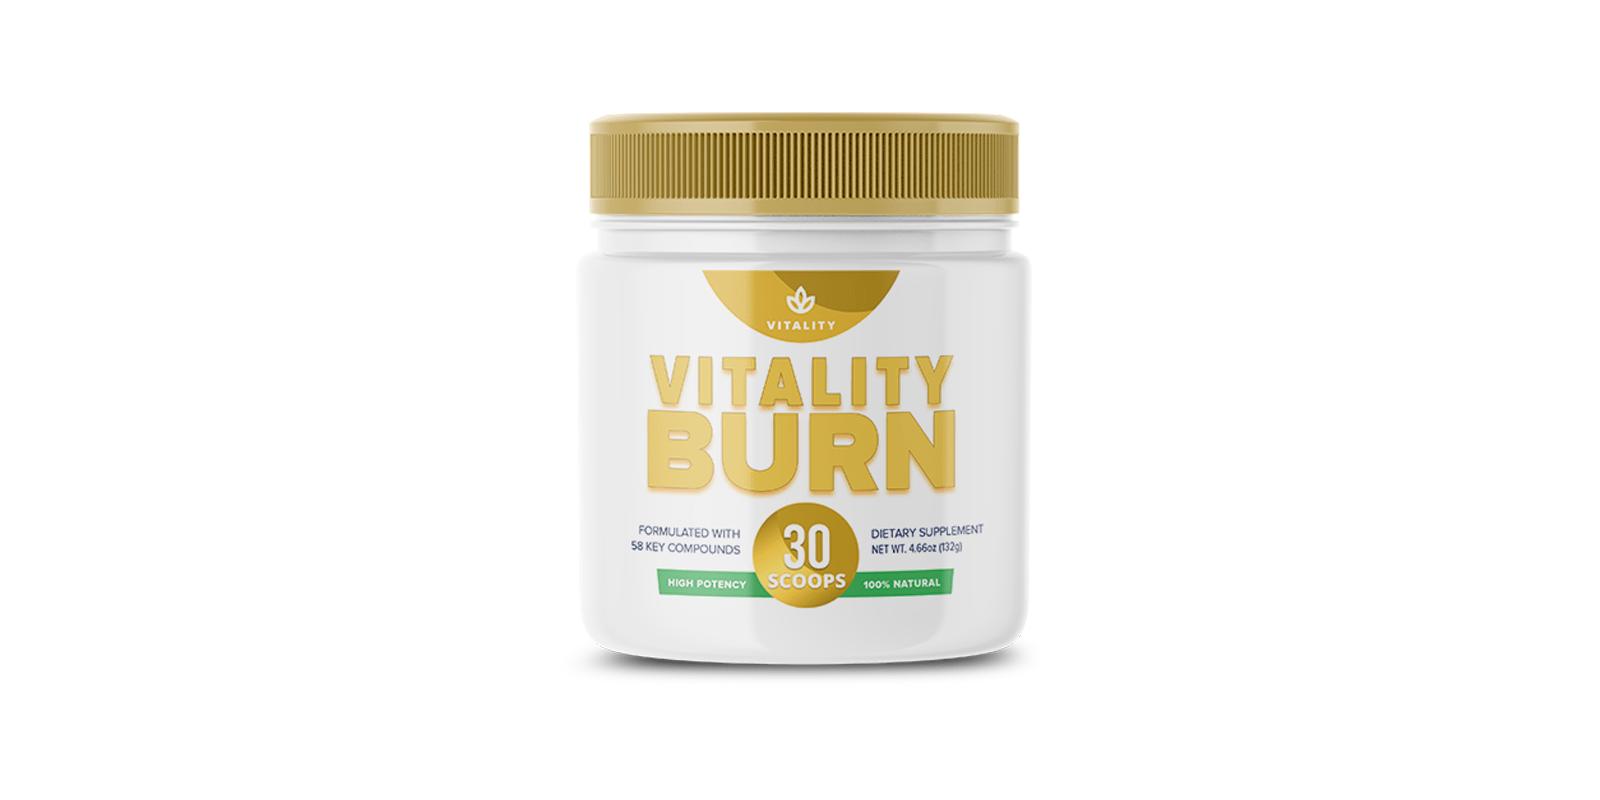 Vitality-burn-review